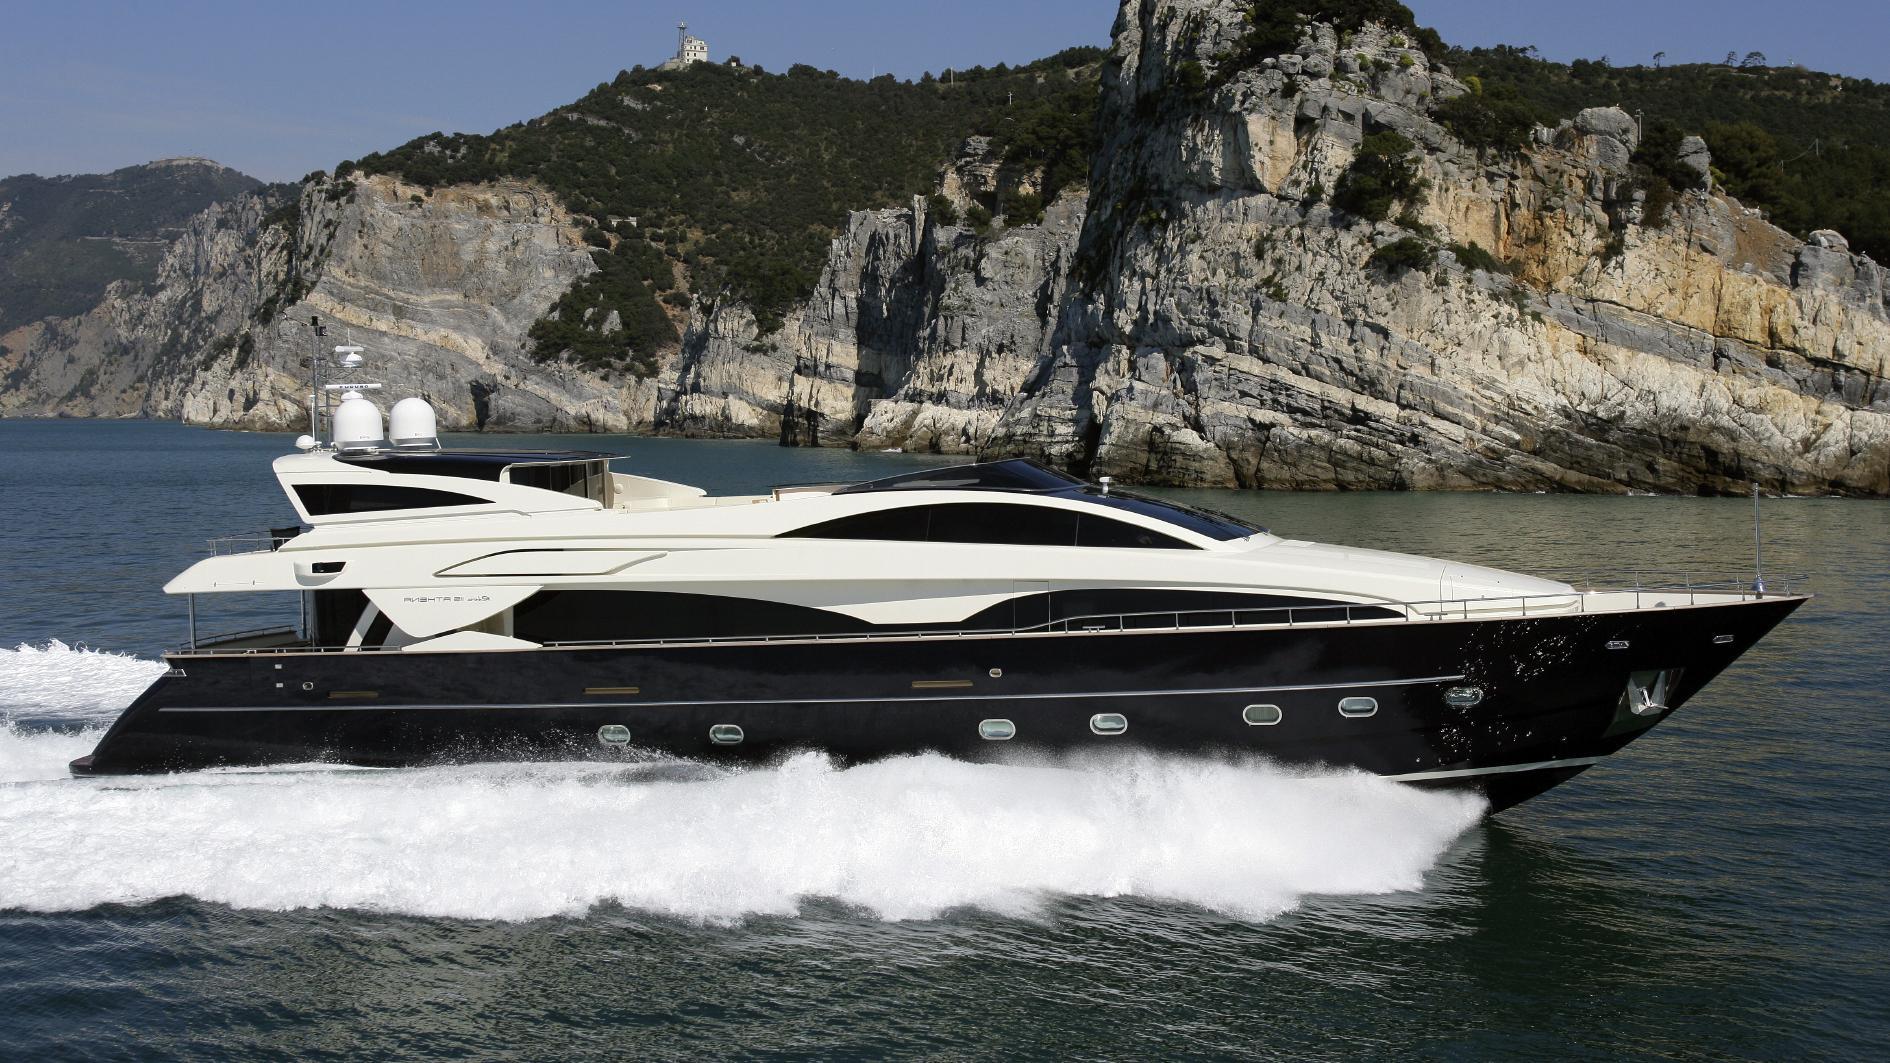 moud-motor-yacht-riva-athena-115-2008-35m-profile